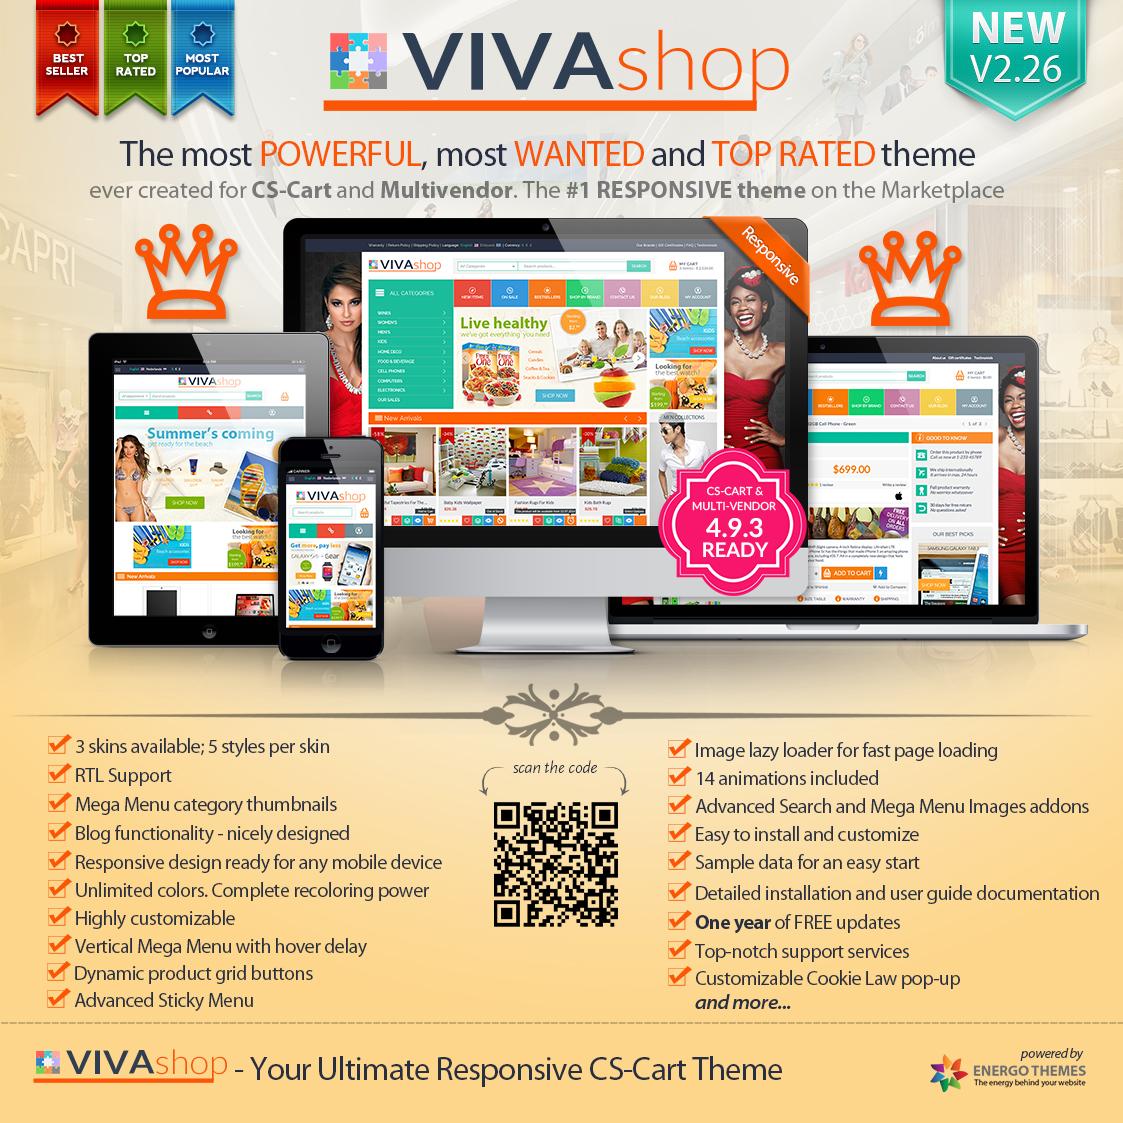 VIVAshop-V2.26-presentation-page-MP.jpg